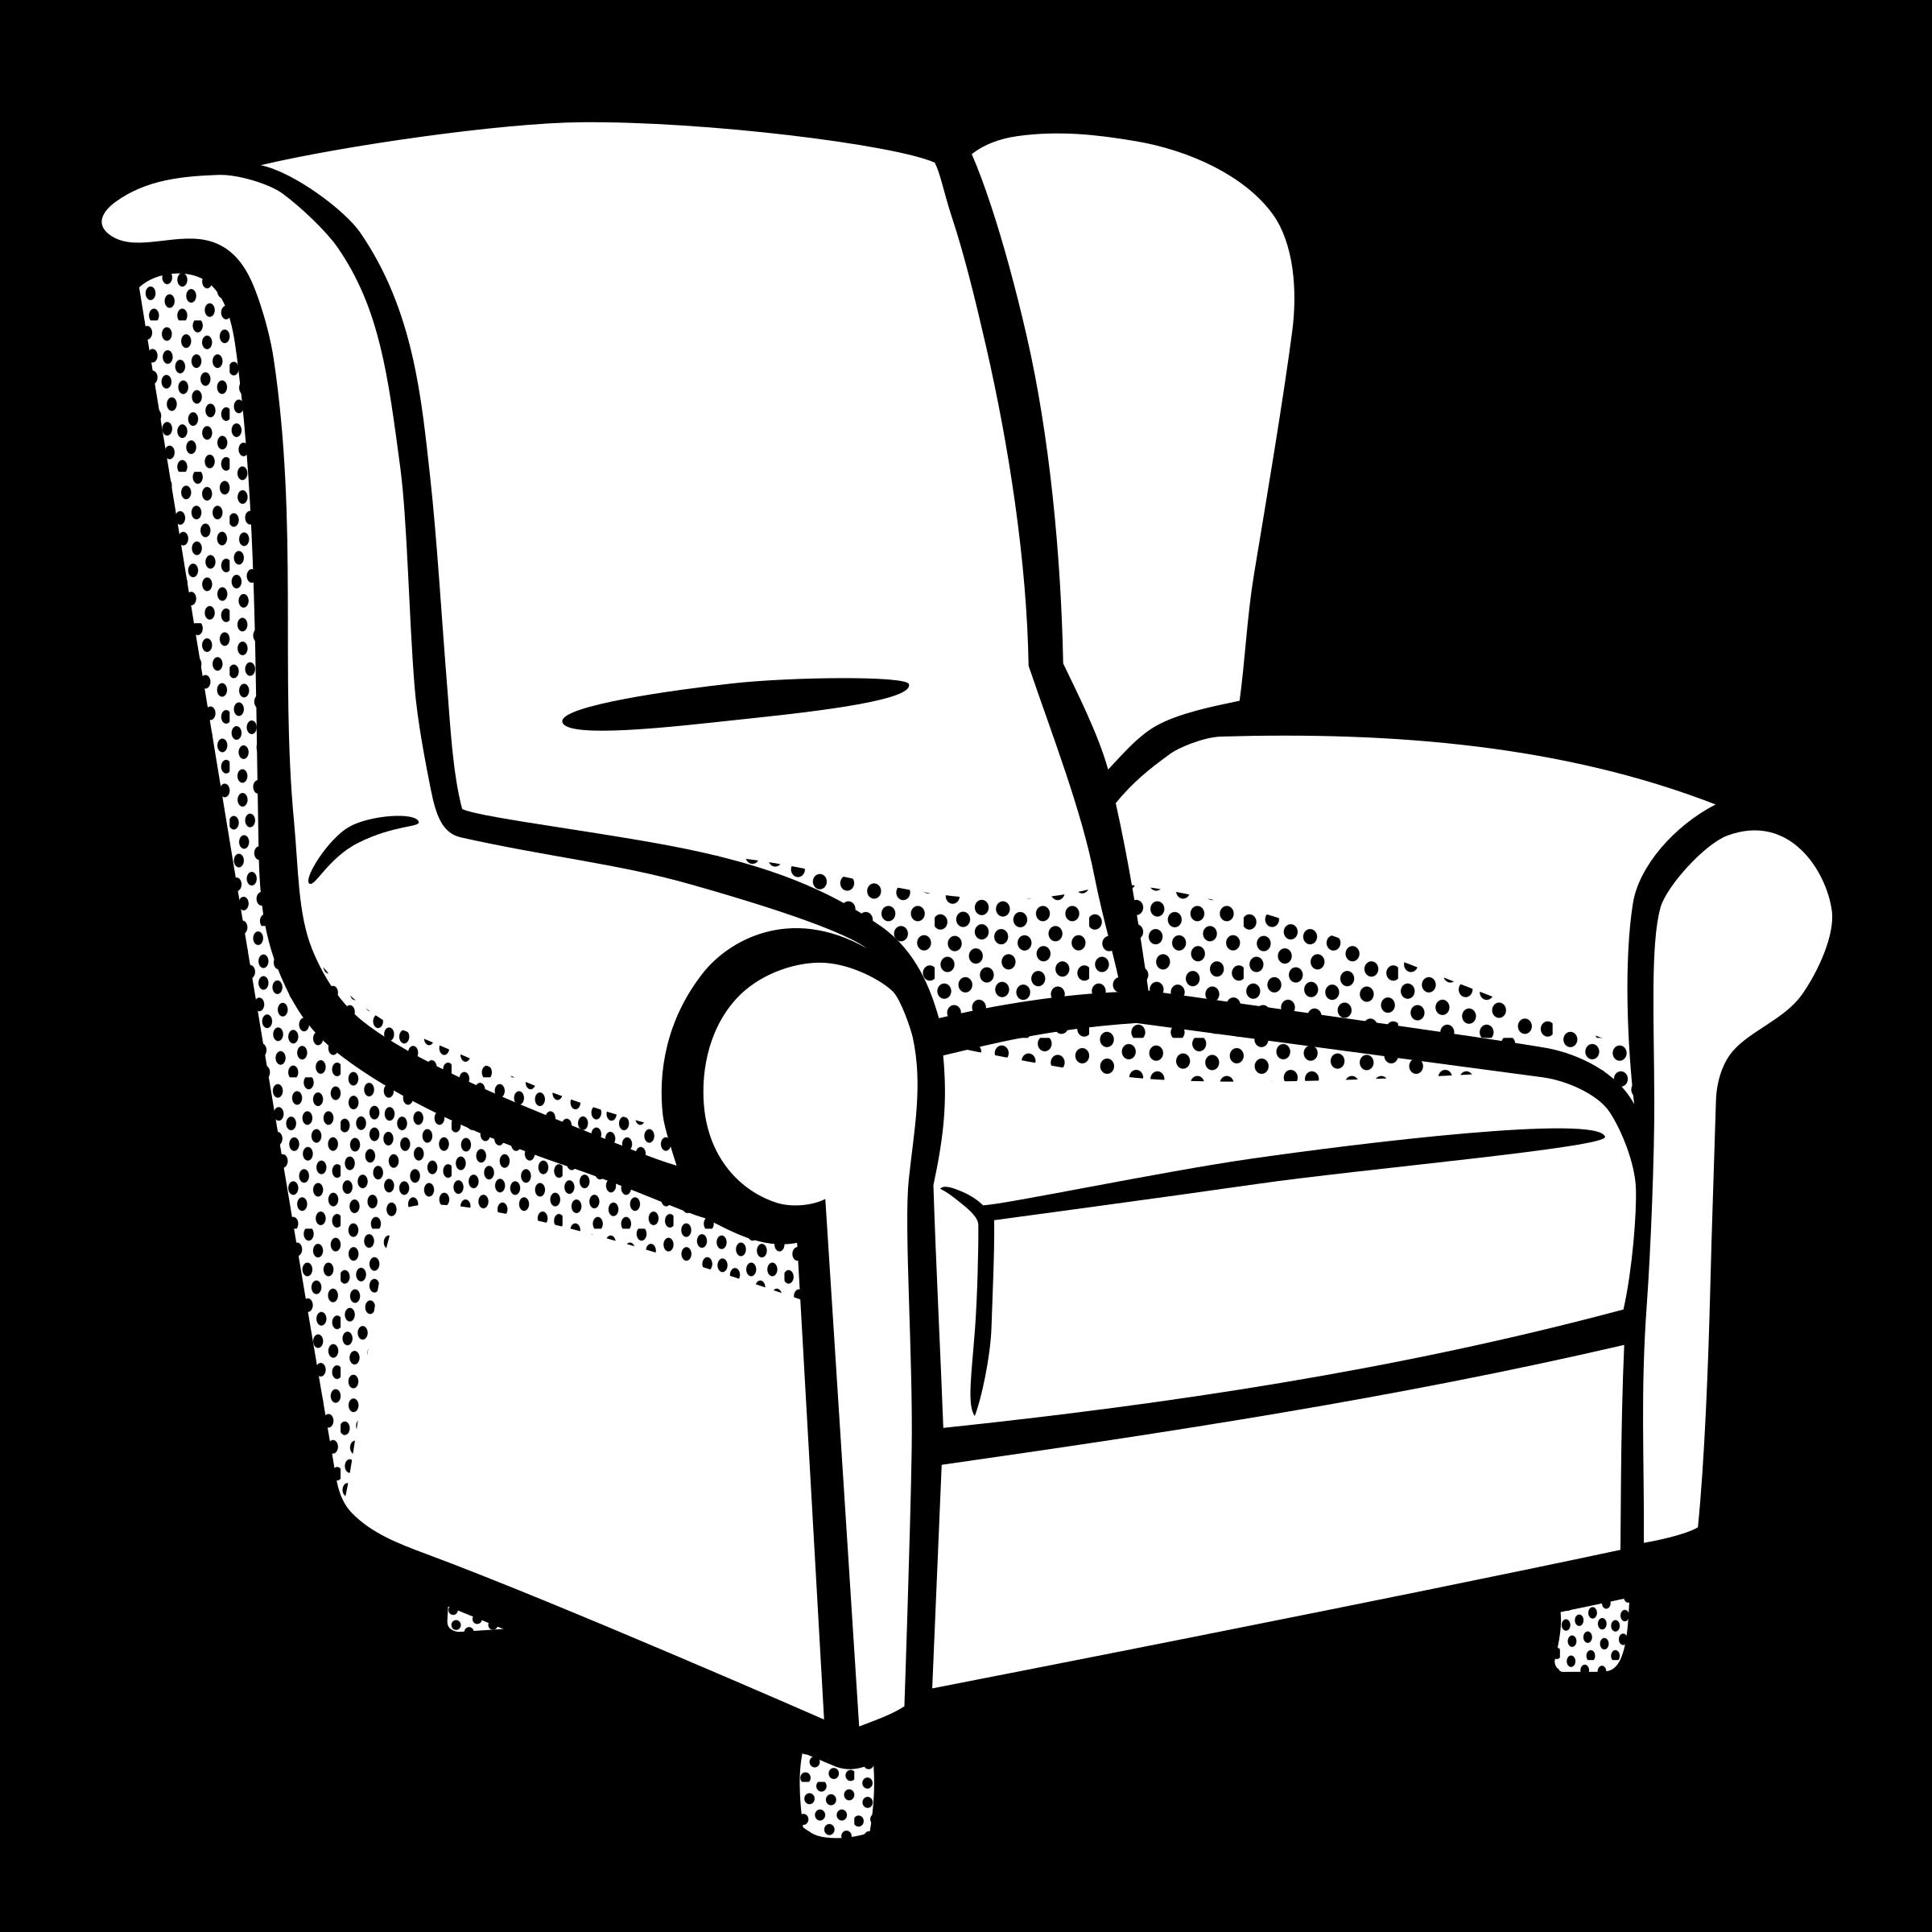 vector library download Sofa Chair Drawing at GetDrawings